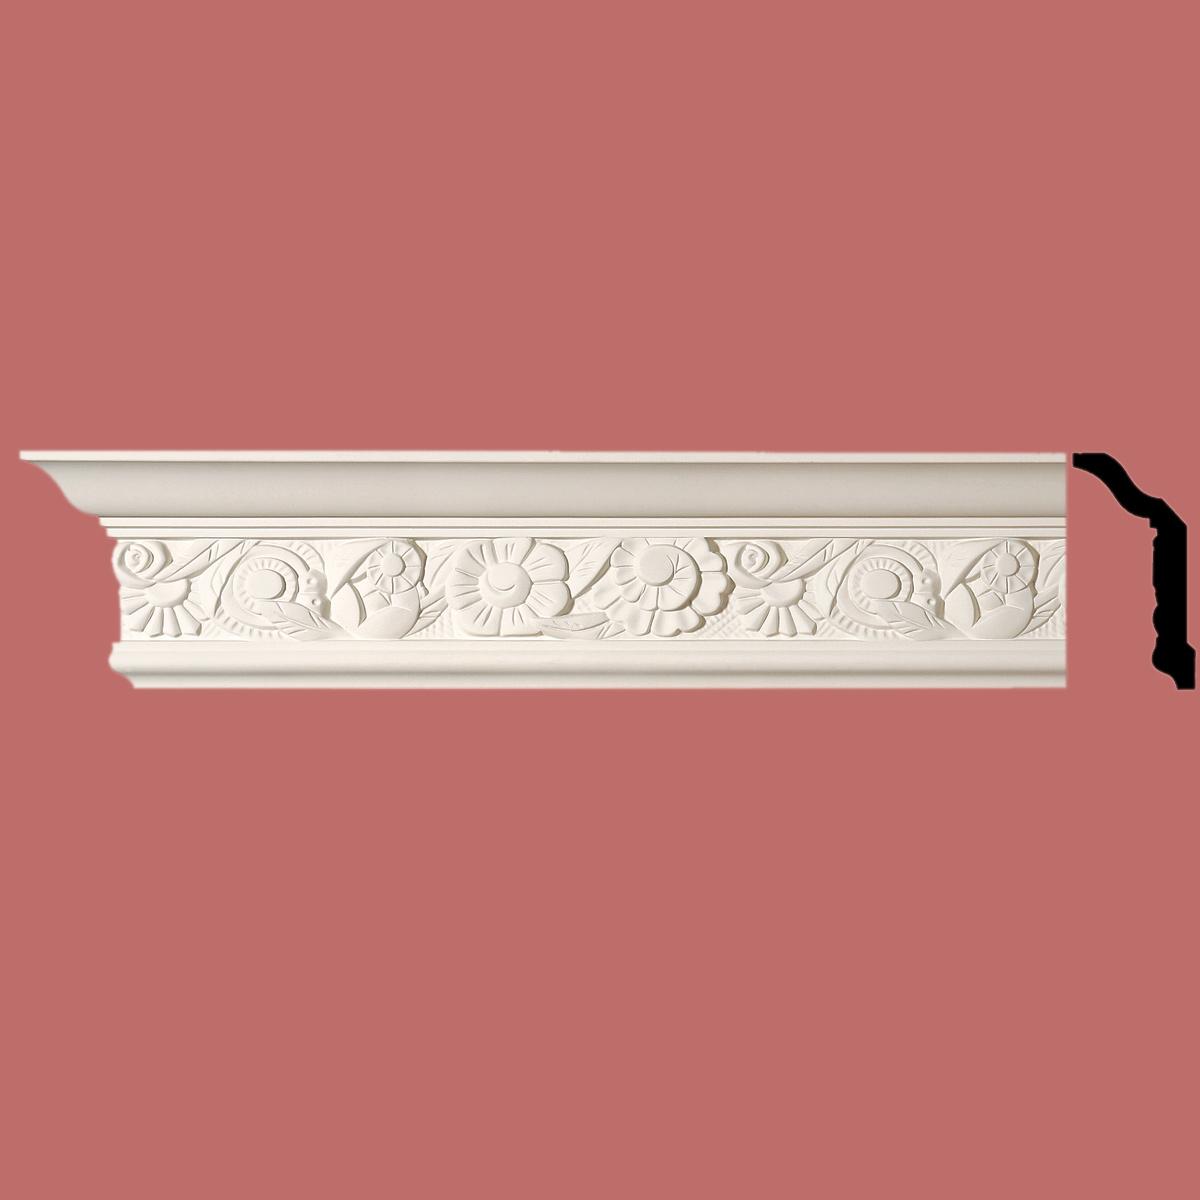 Cornice White Urethane Sample of 11593 24 Long Cornice Cornice Moulding Cornice Molding